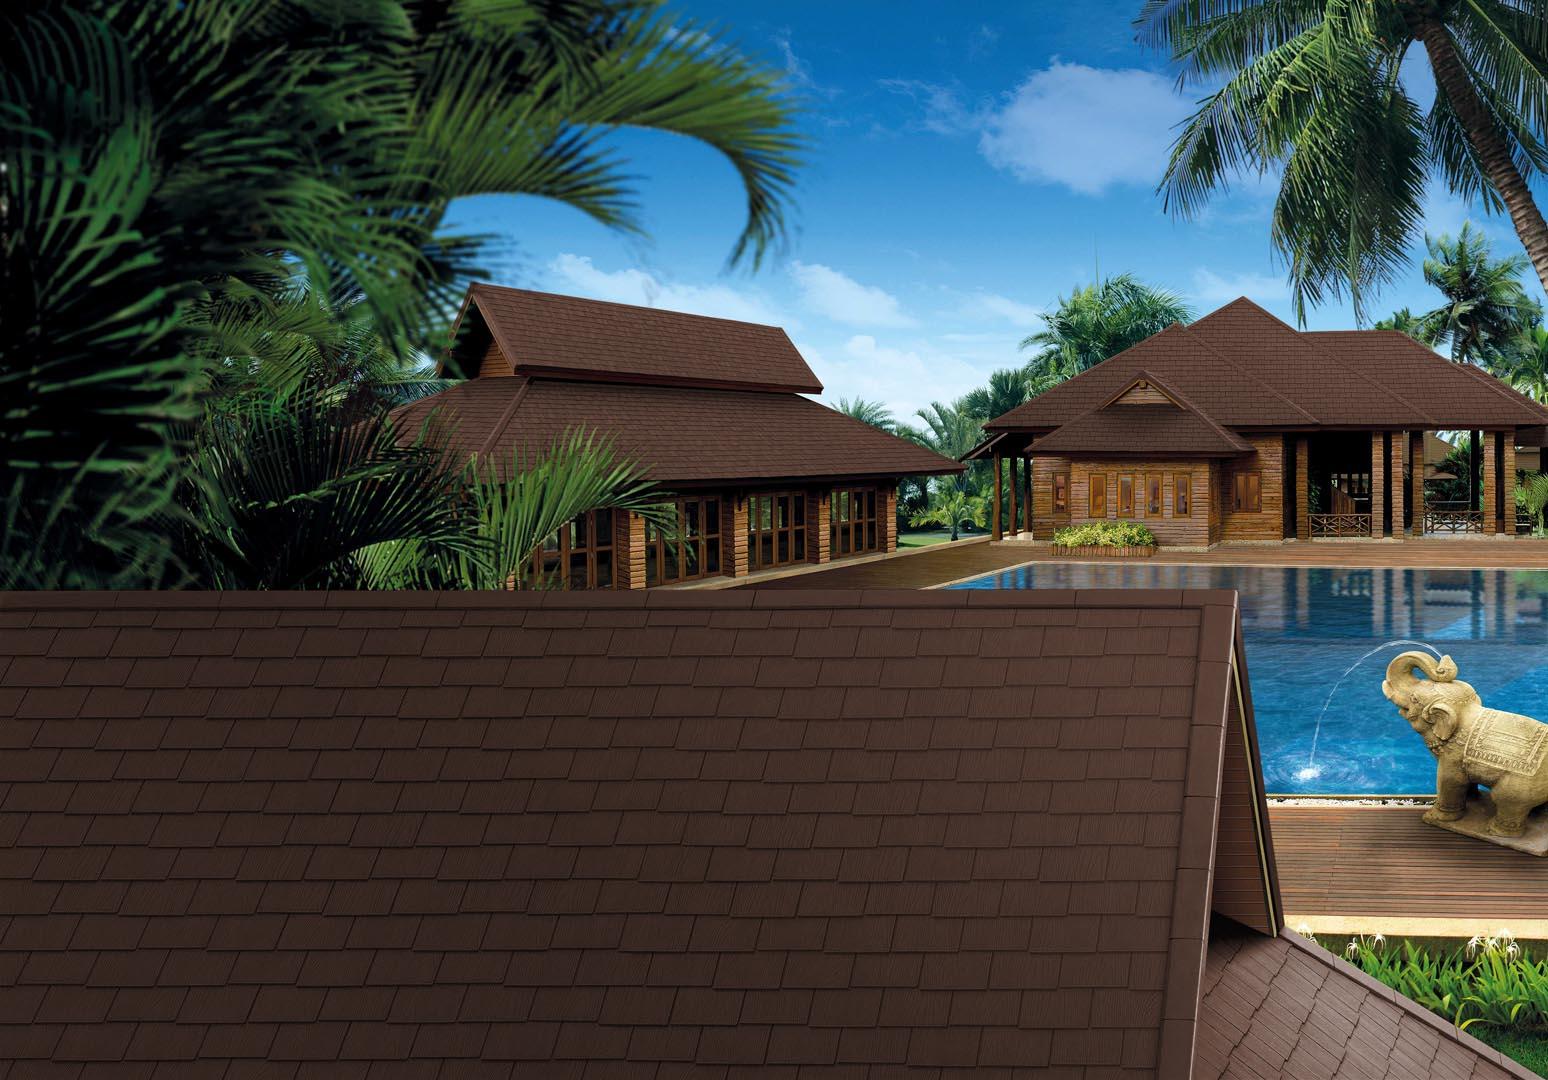 SCG-Fiber-Cement-Roof-Ayara-Timber-Grain-Hazel-Brown-4-made-in-thailand